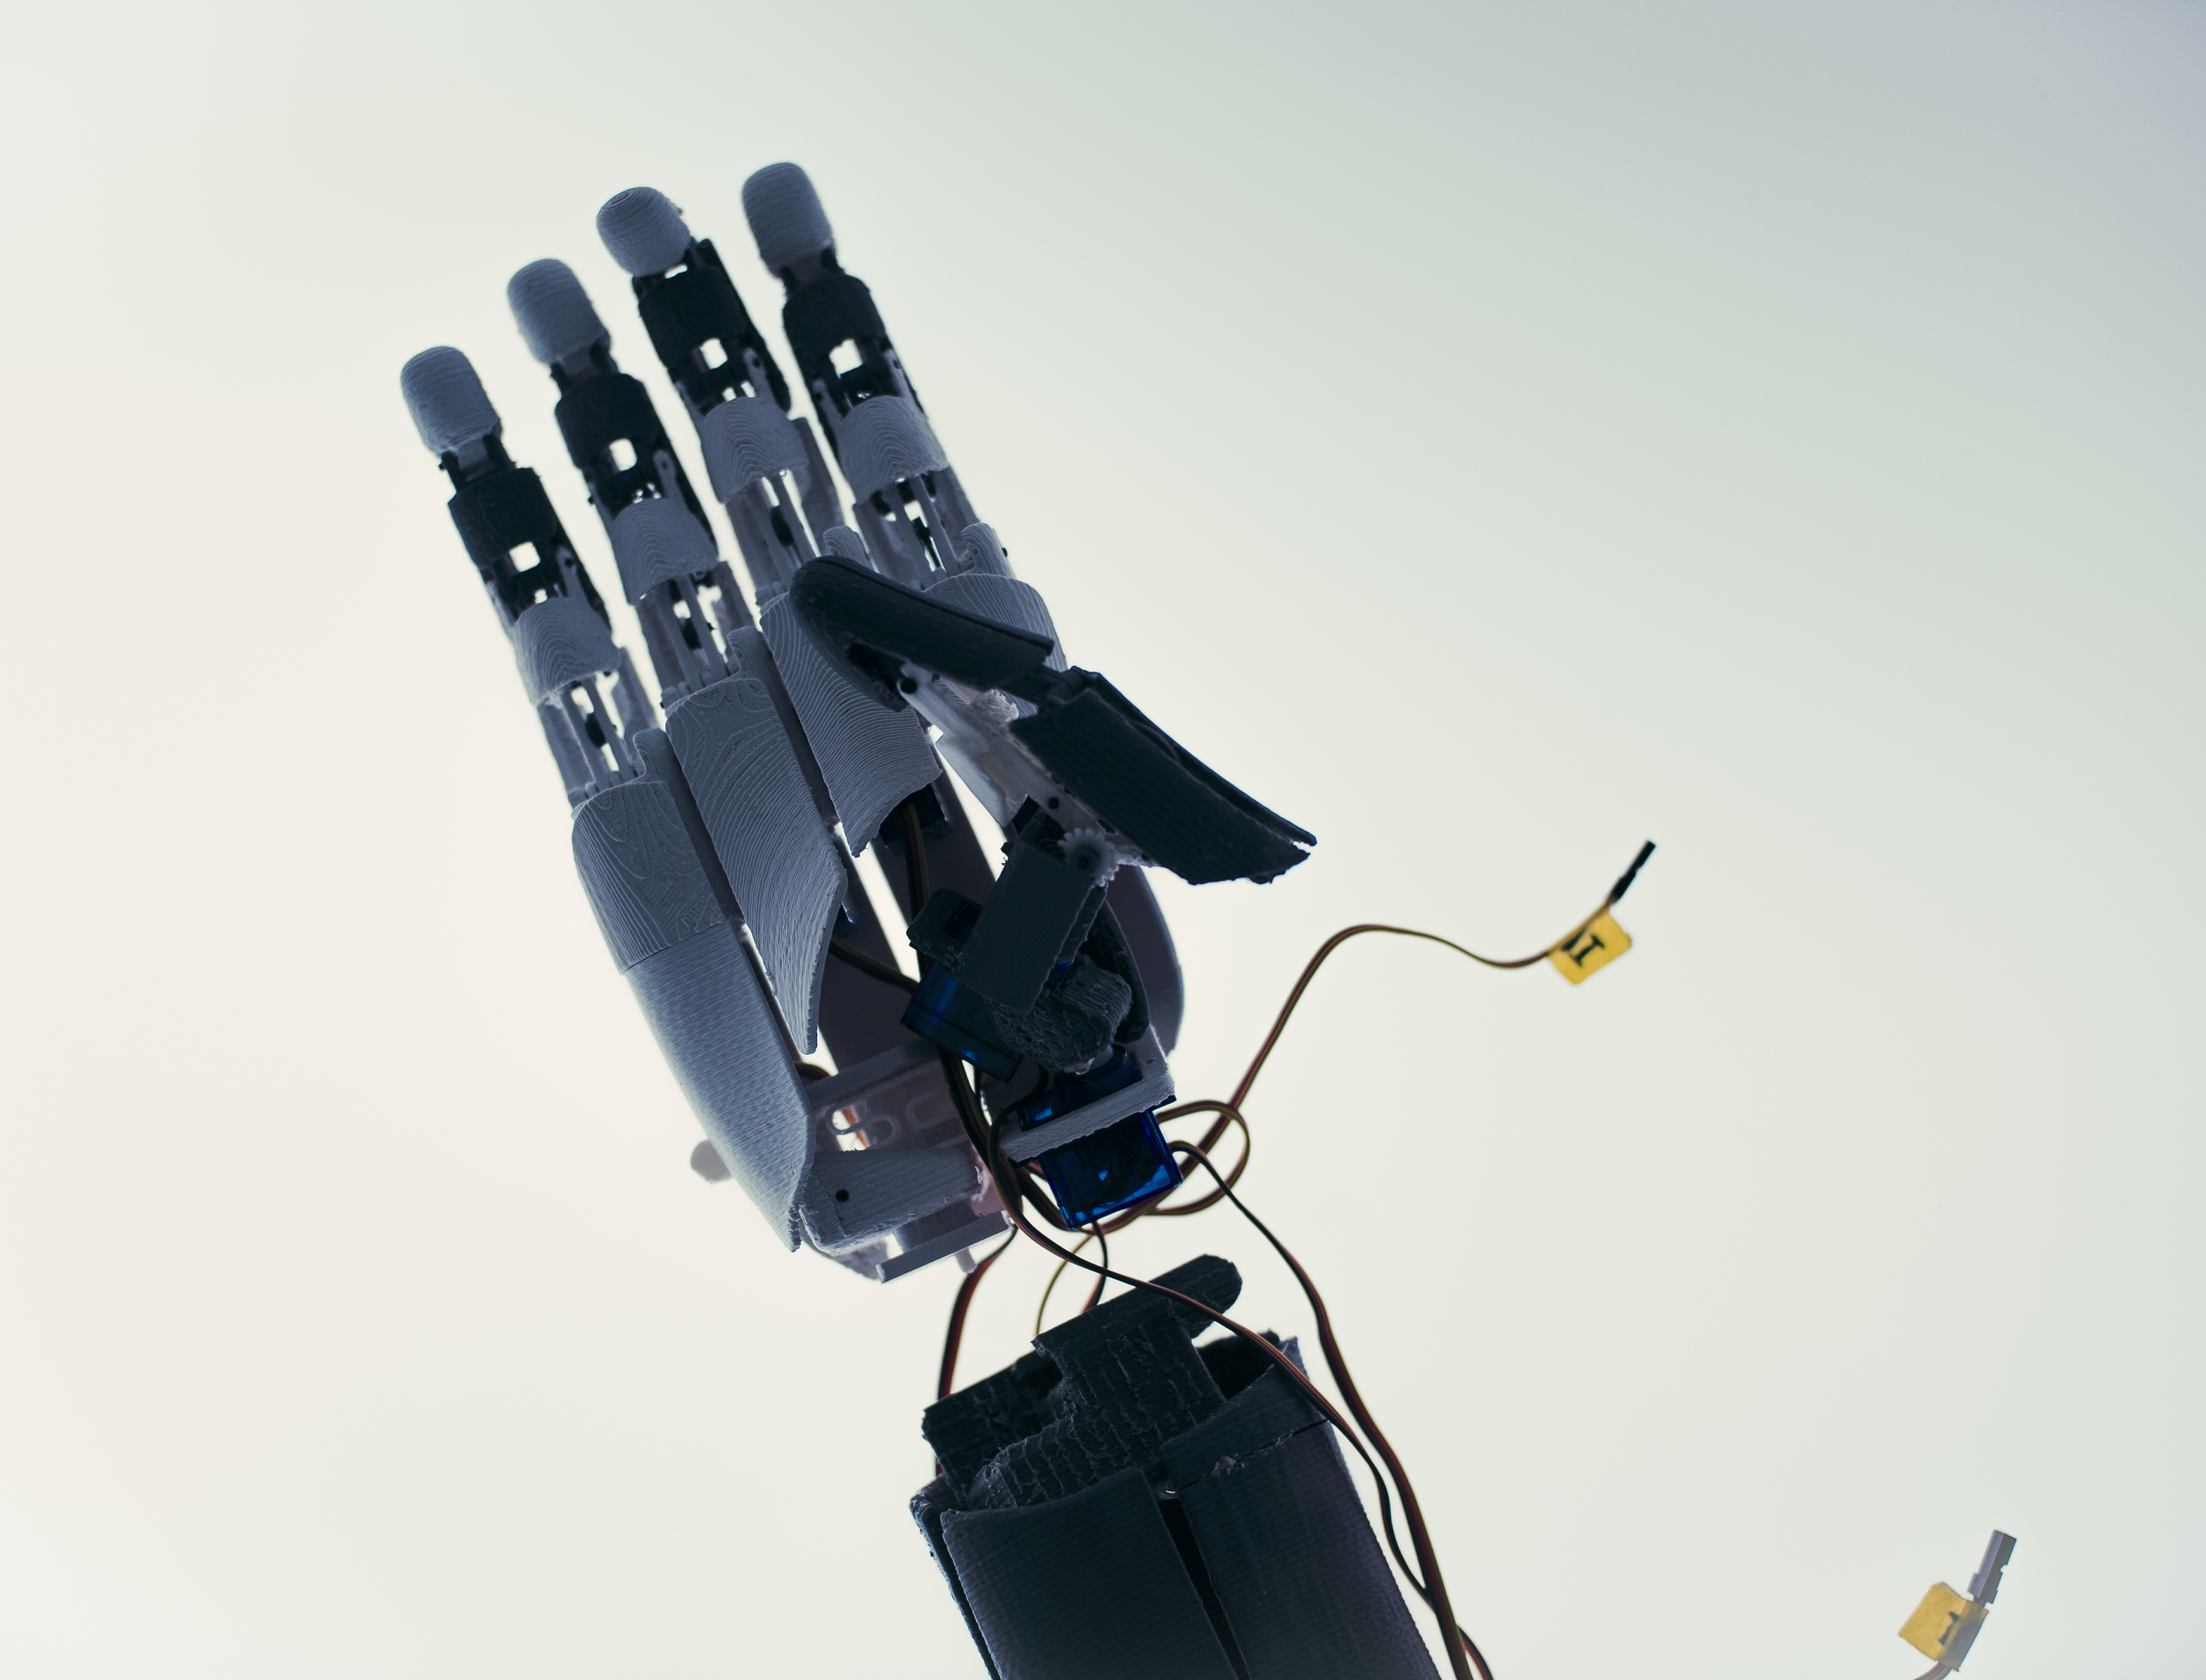 Terminator's Arm